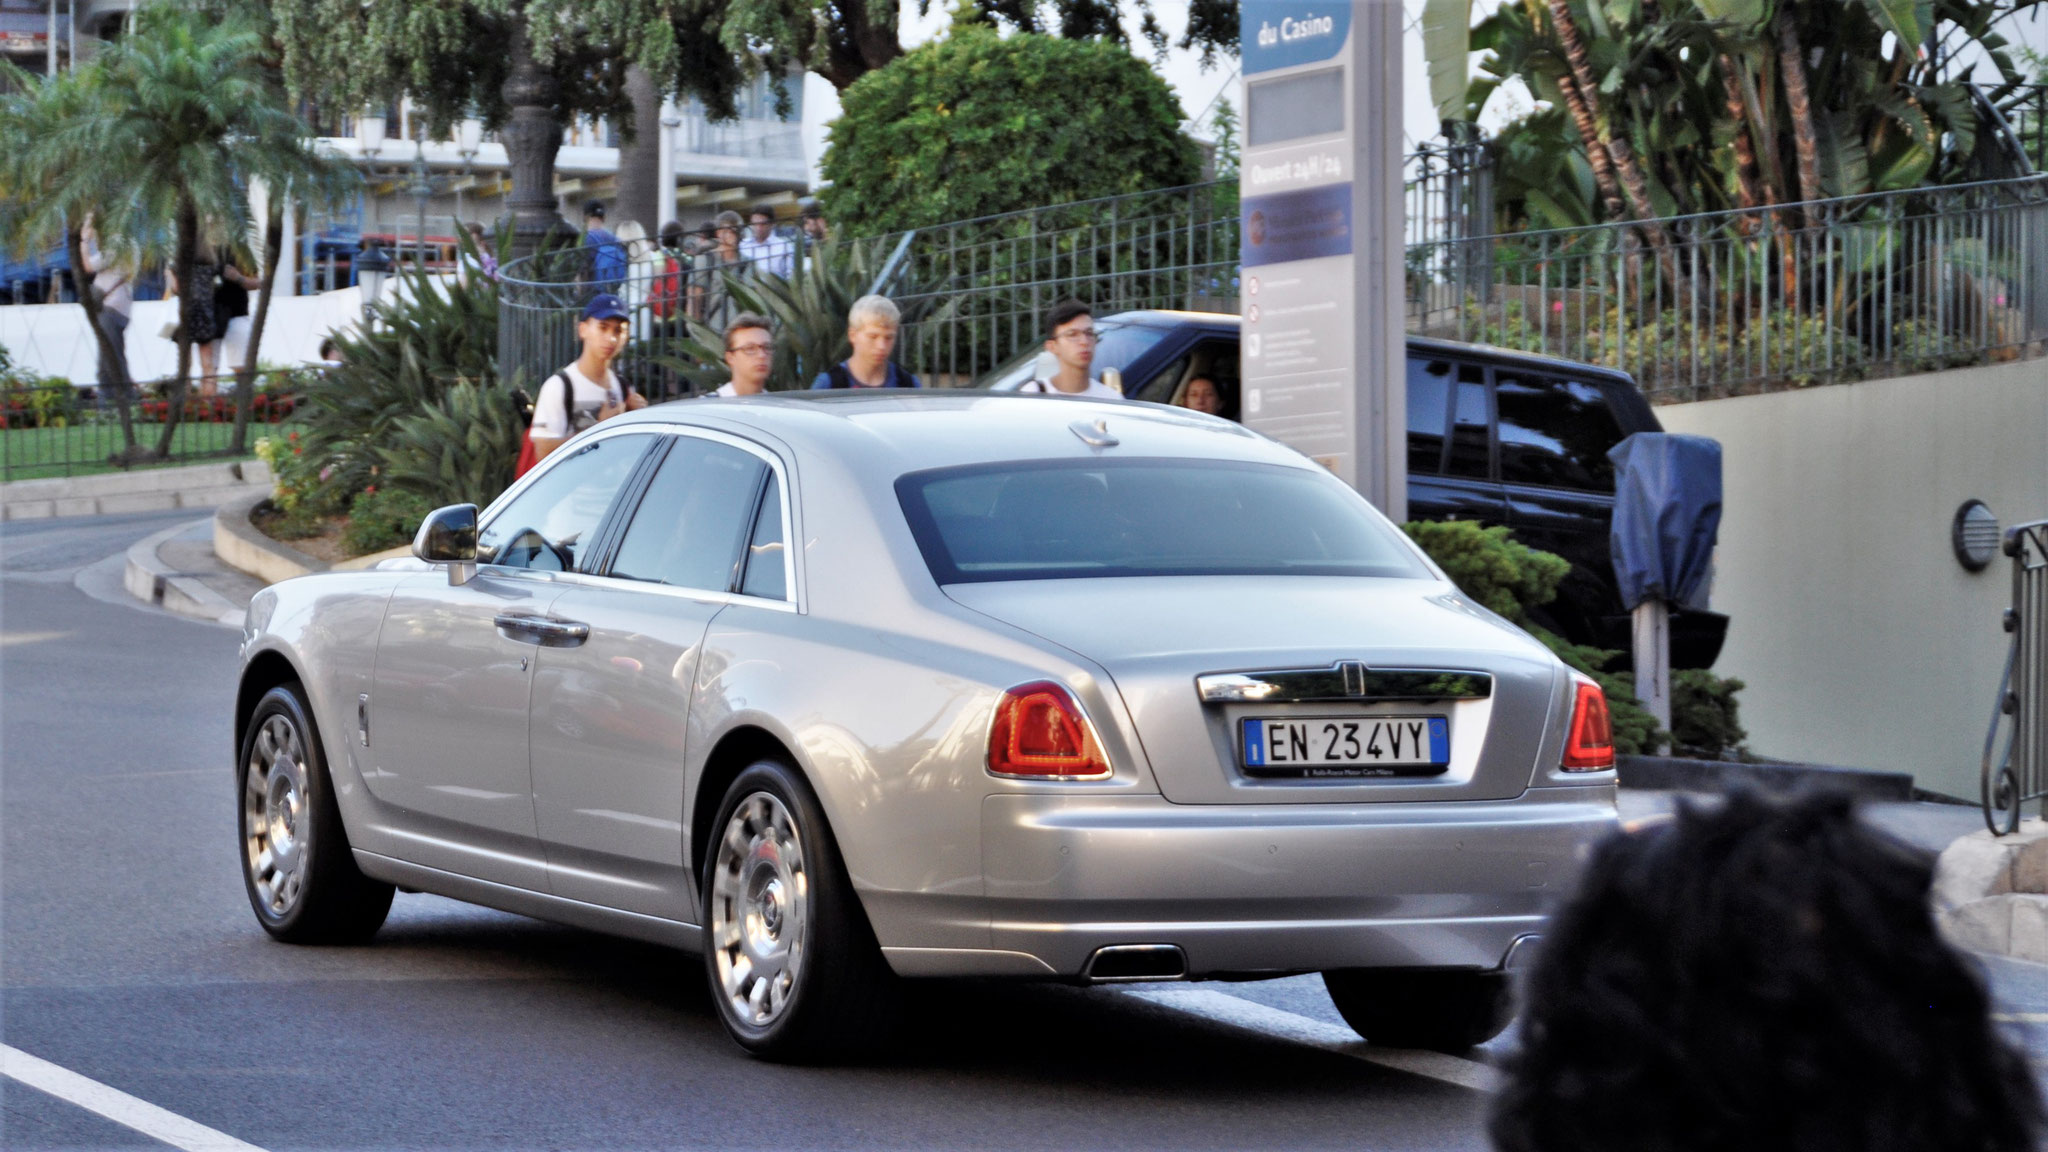 Rolls Royce Ghost - EN-234-VY (ITA)